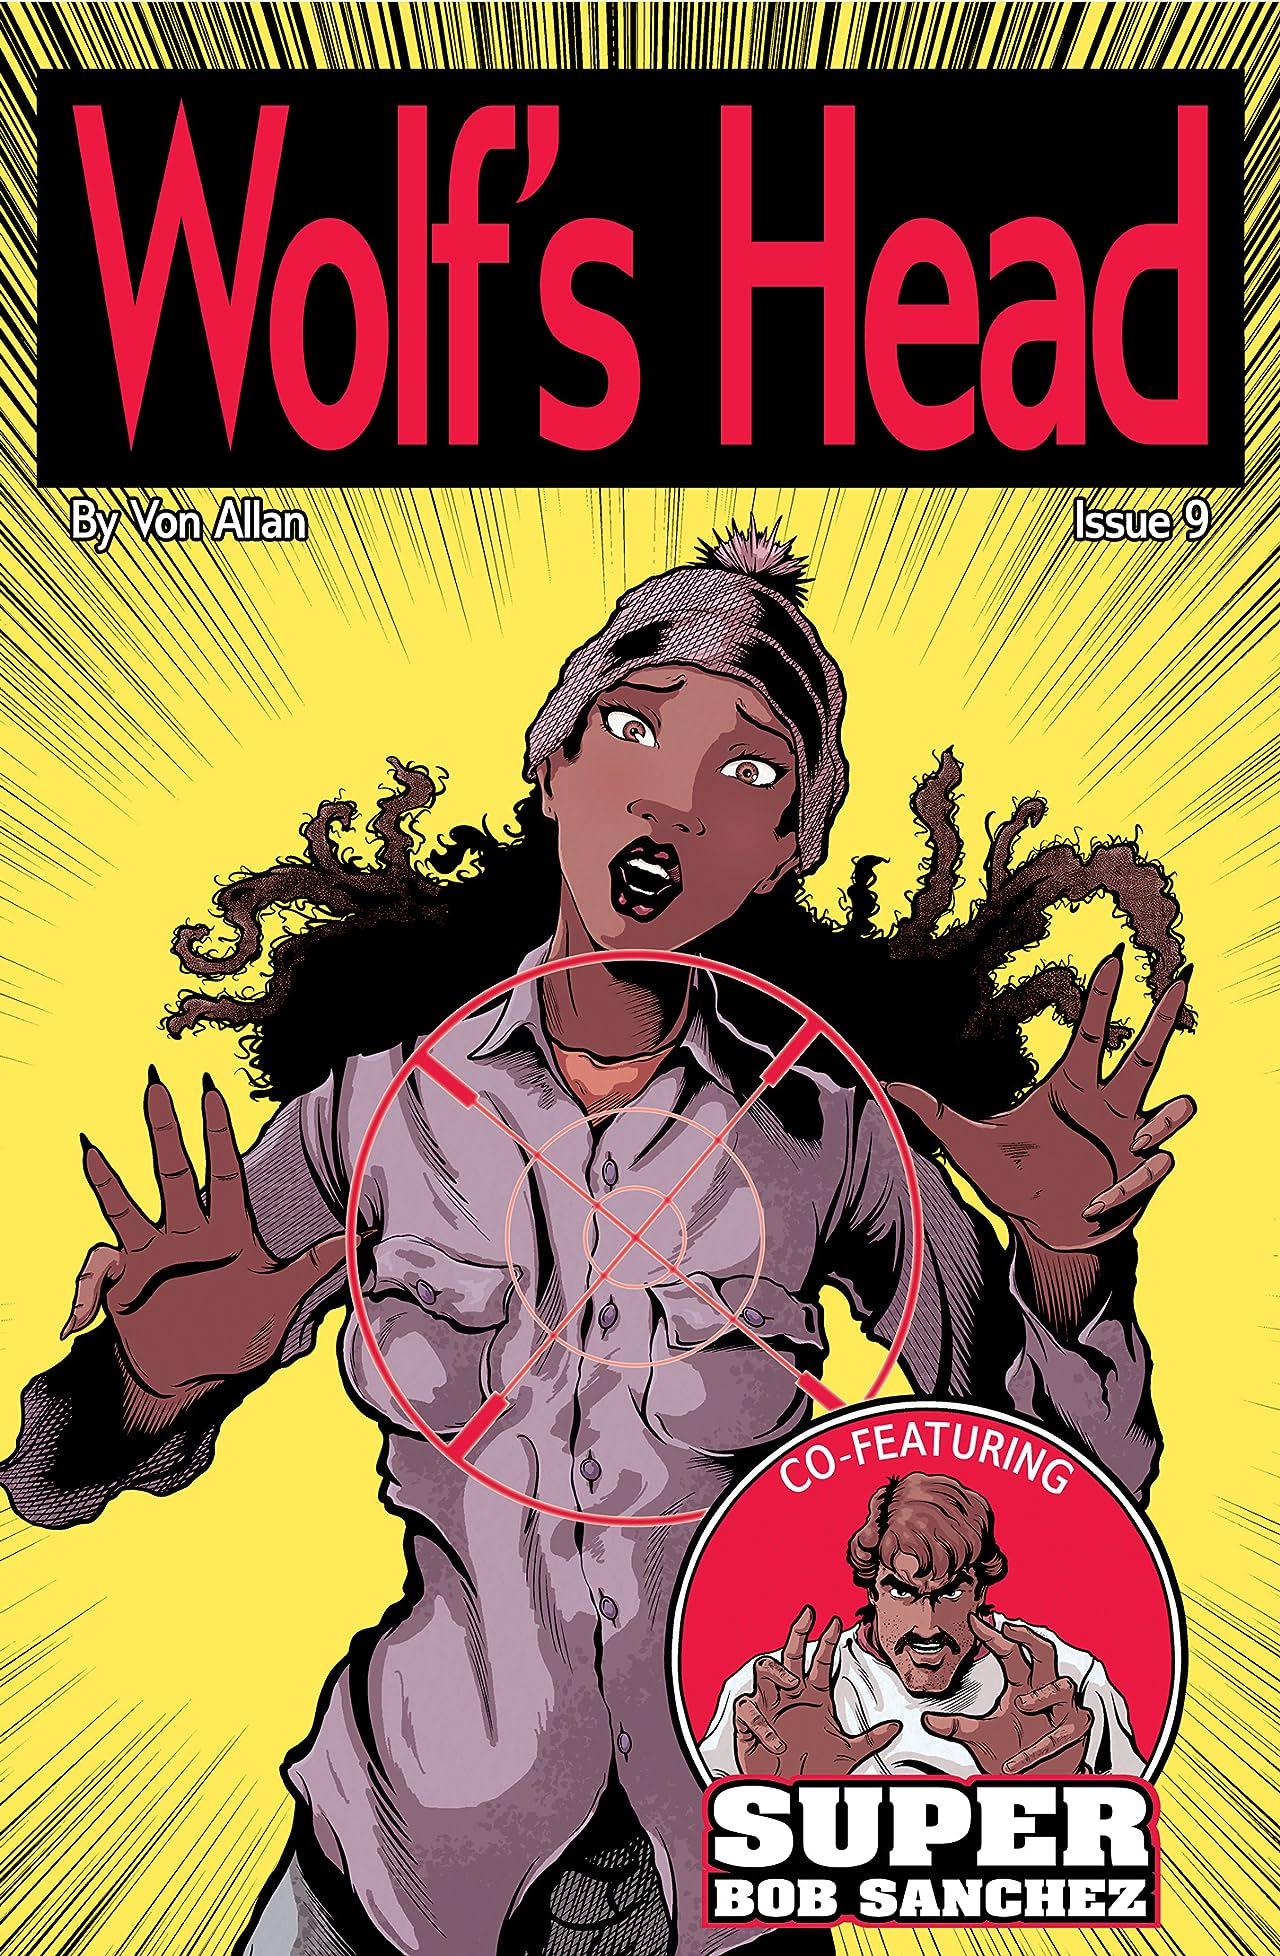 Wolf's Head #9